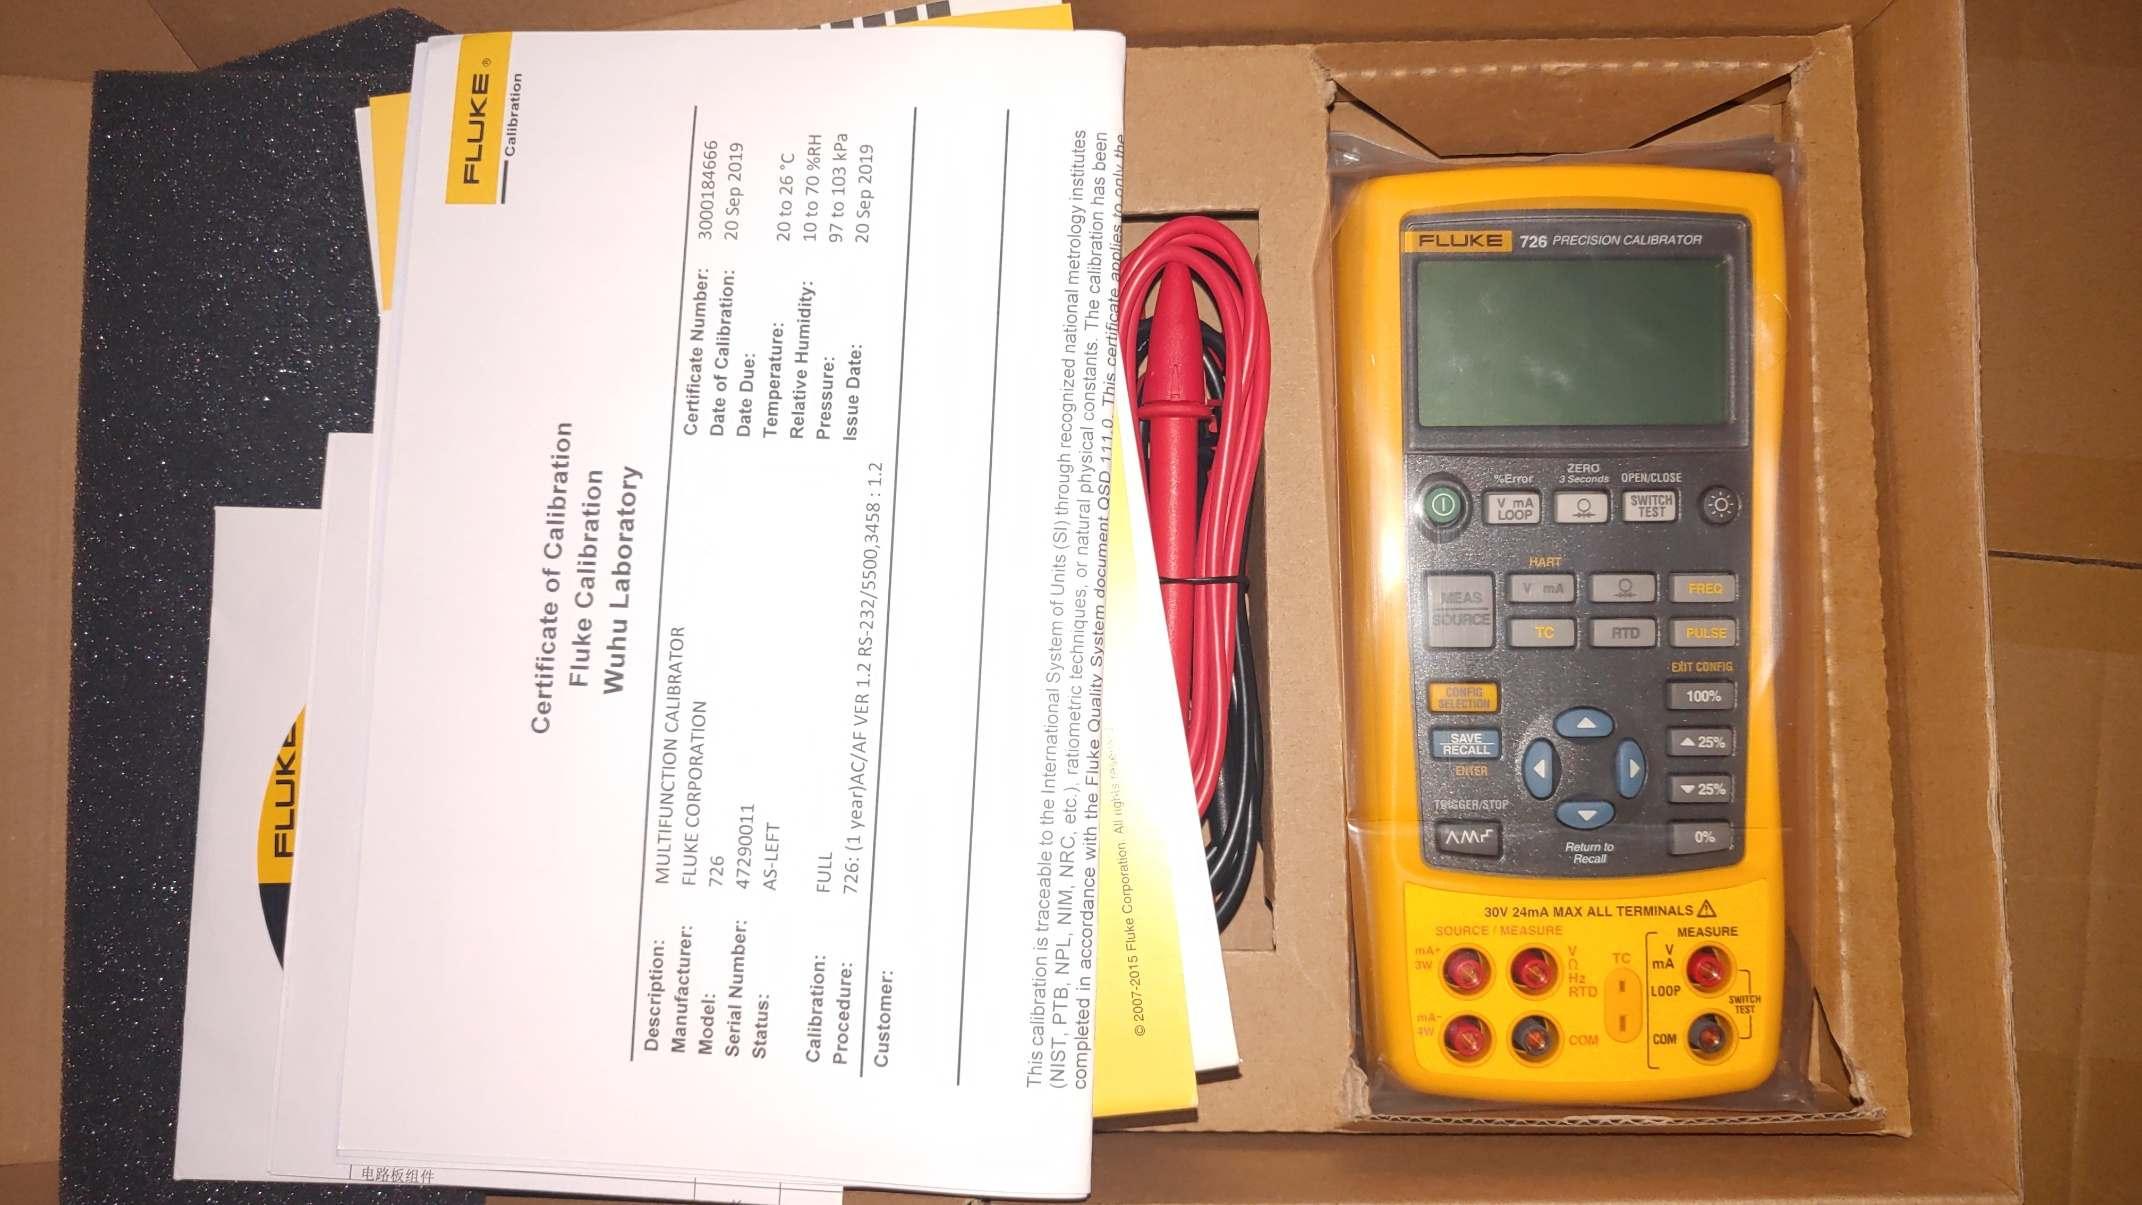 Fluke過程校驗儀F726CN福祿克